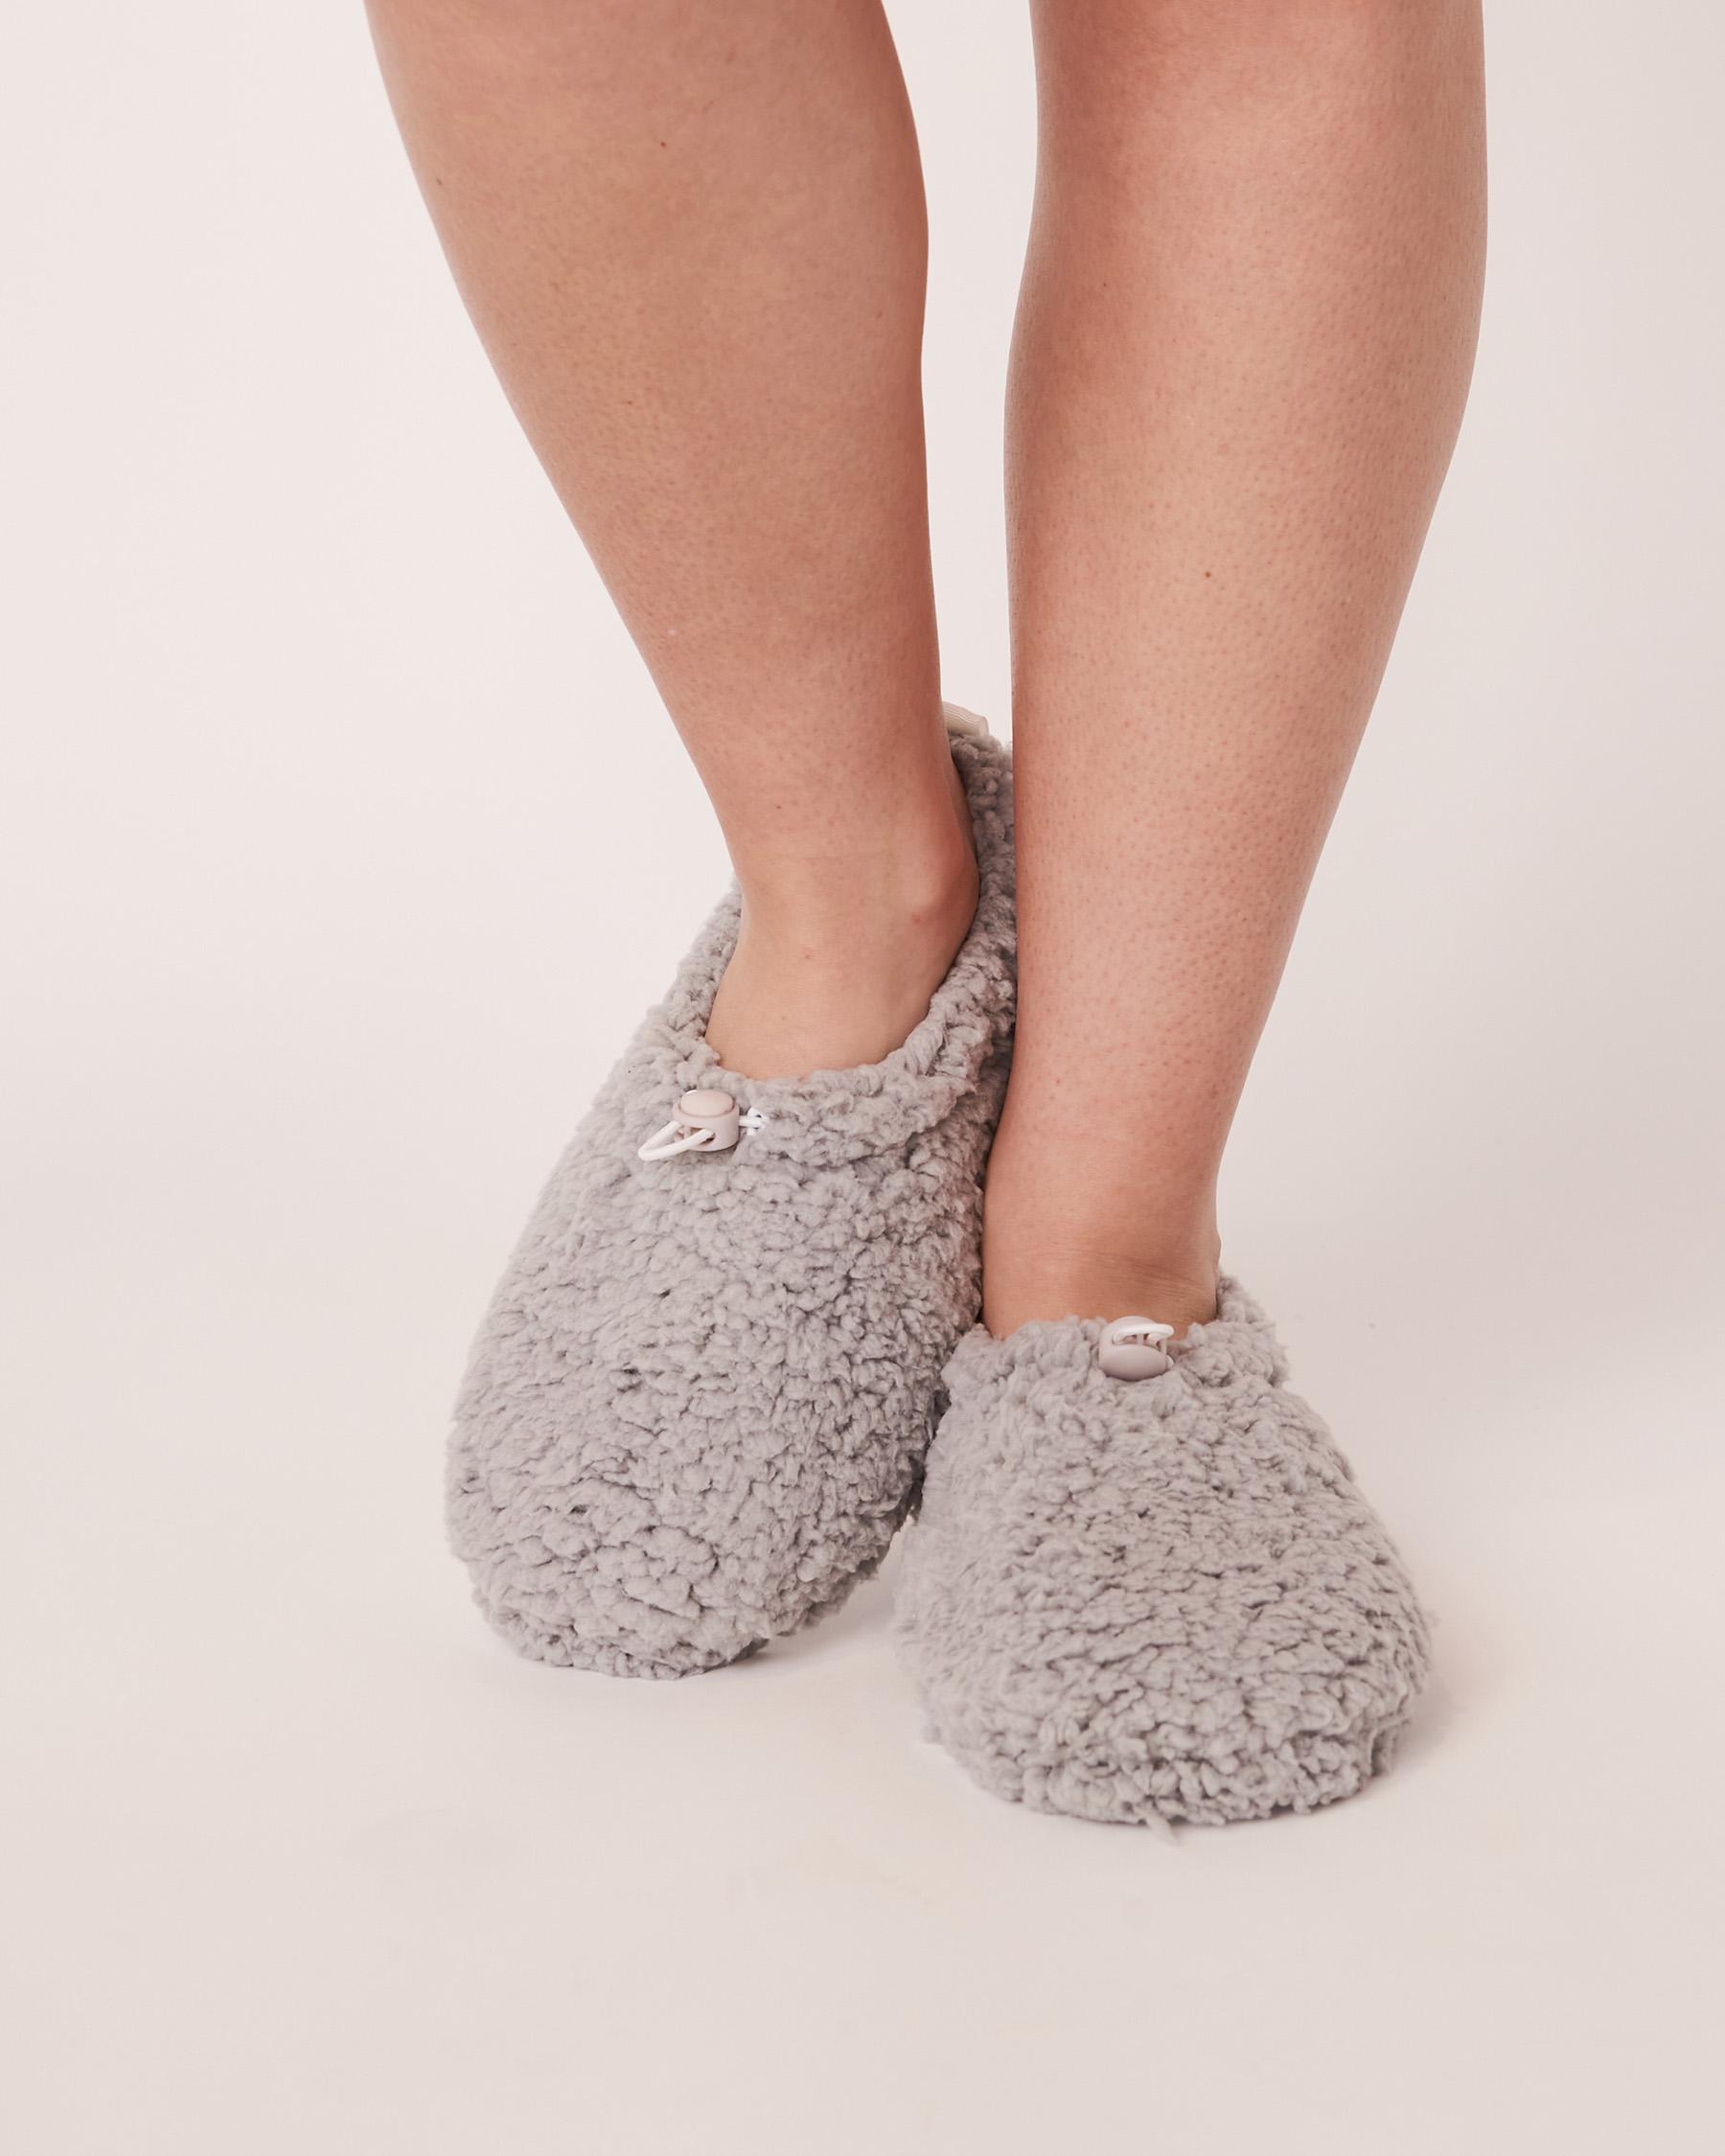 LA VIE EN ROSE Sherpa Bootie Slippers Grey 40700070 - View1